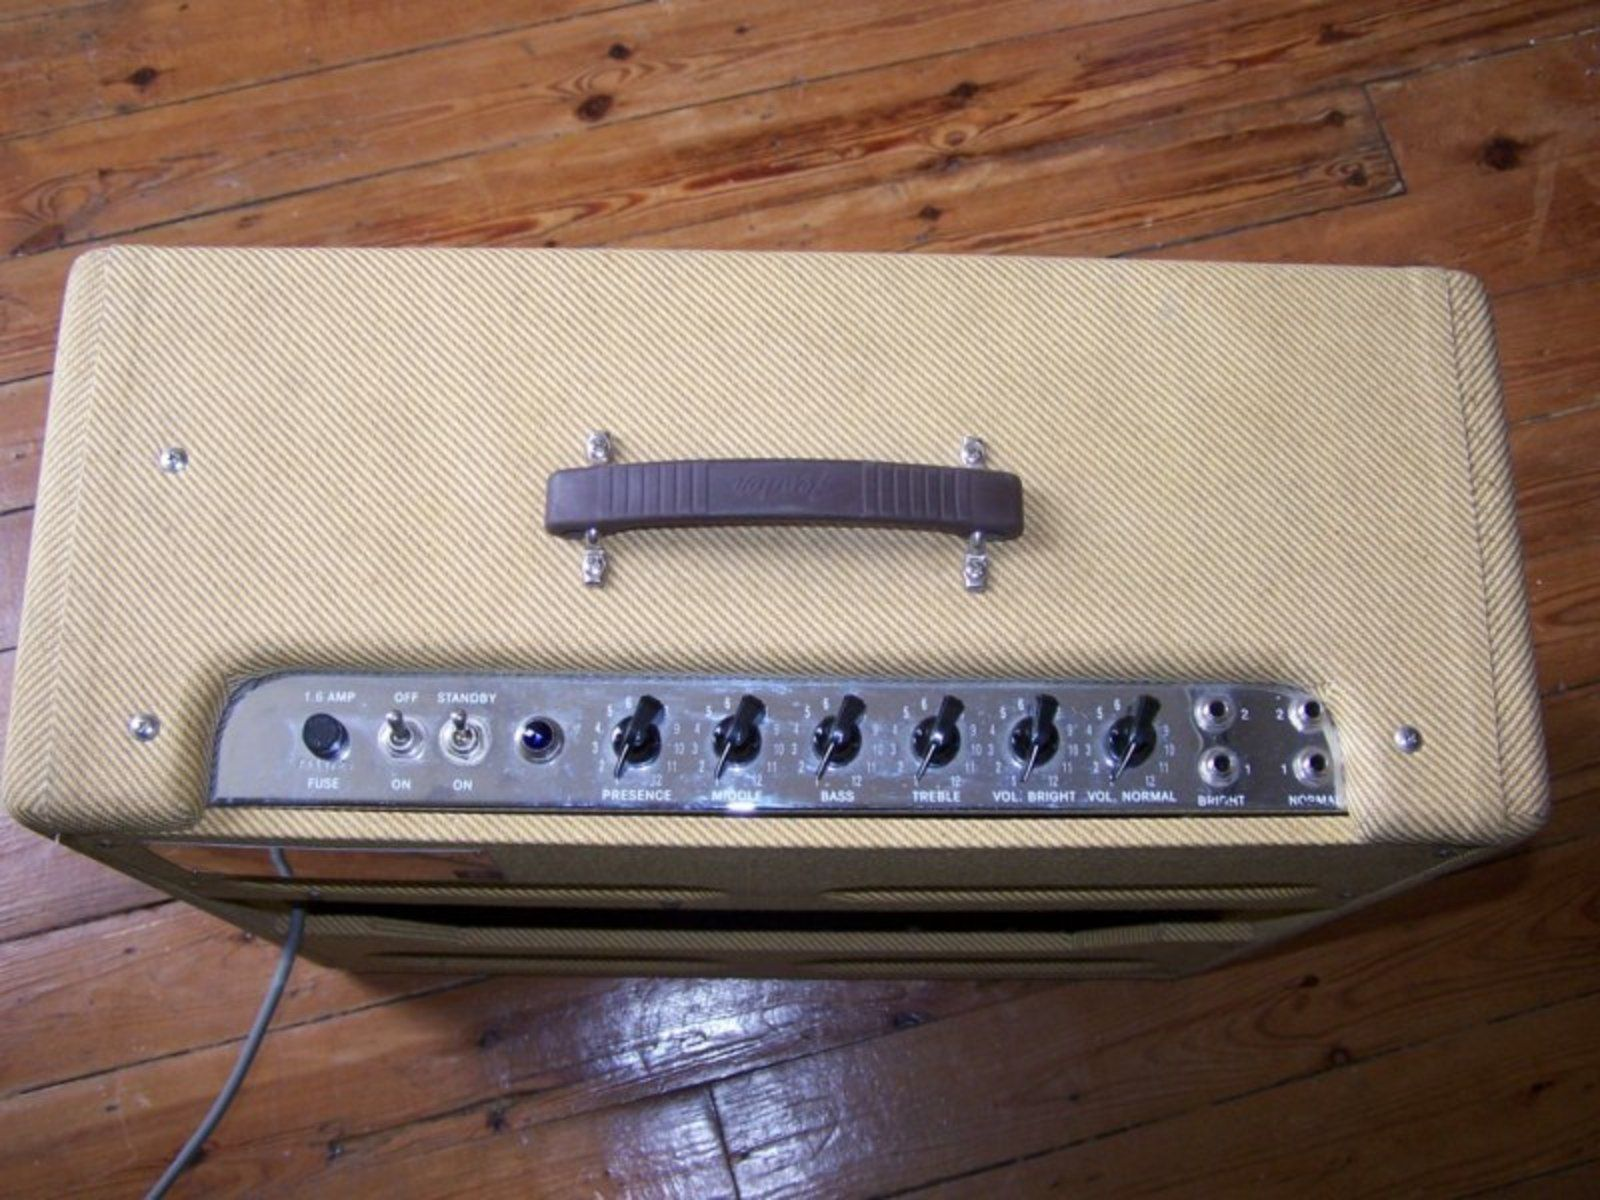 fender vintage reissue 39 59 bassman ltd image 8344 audiofanzine. Black Bedroom Furniture Sets. Home Design Ideas